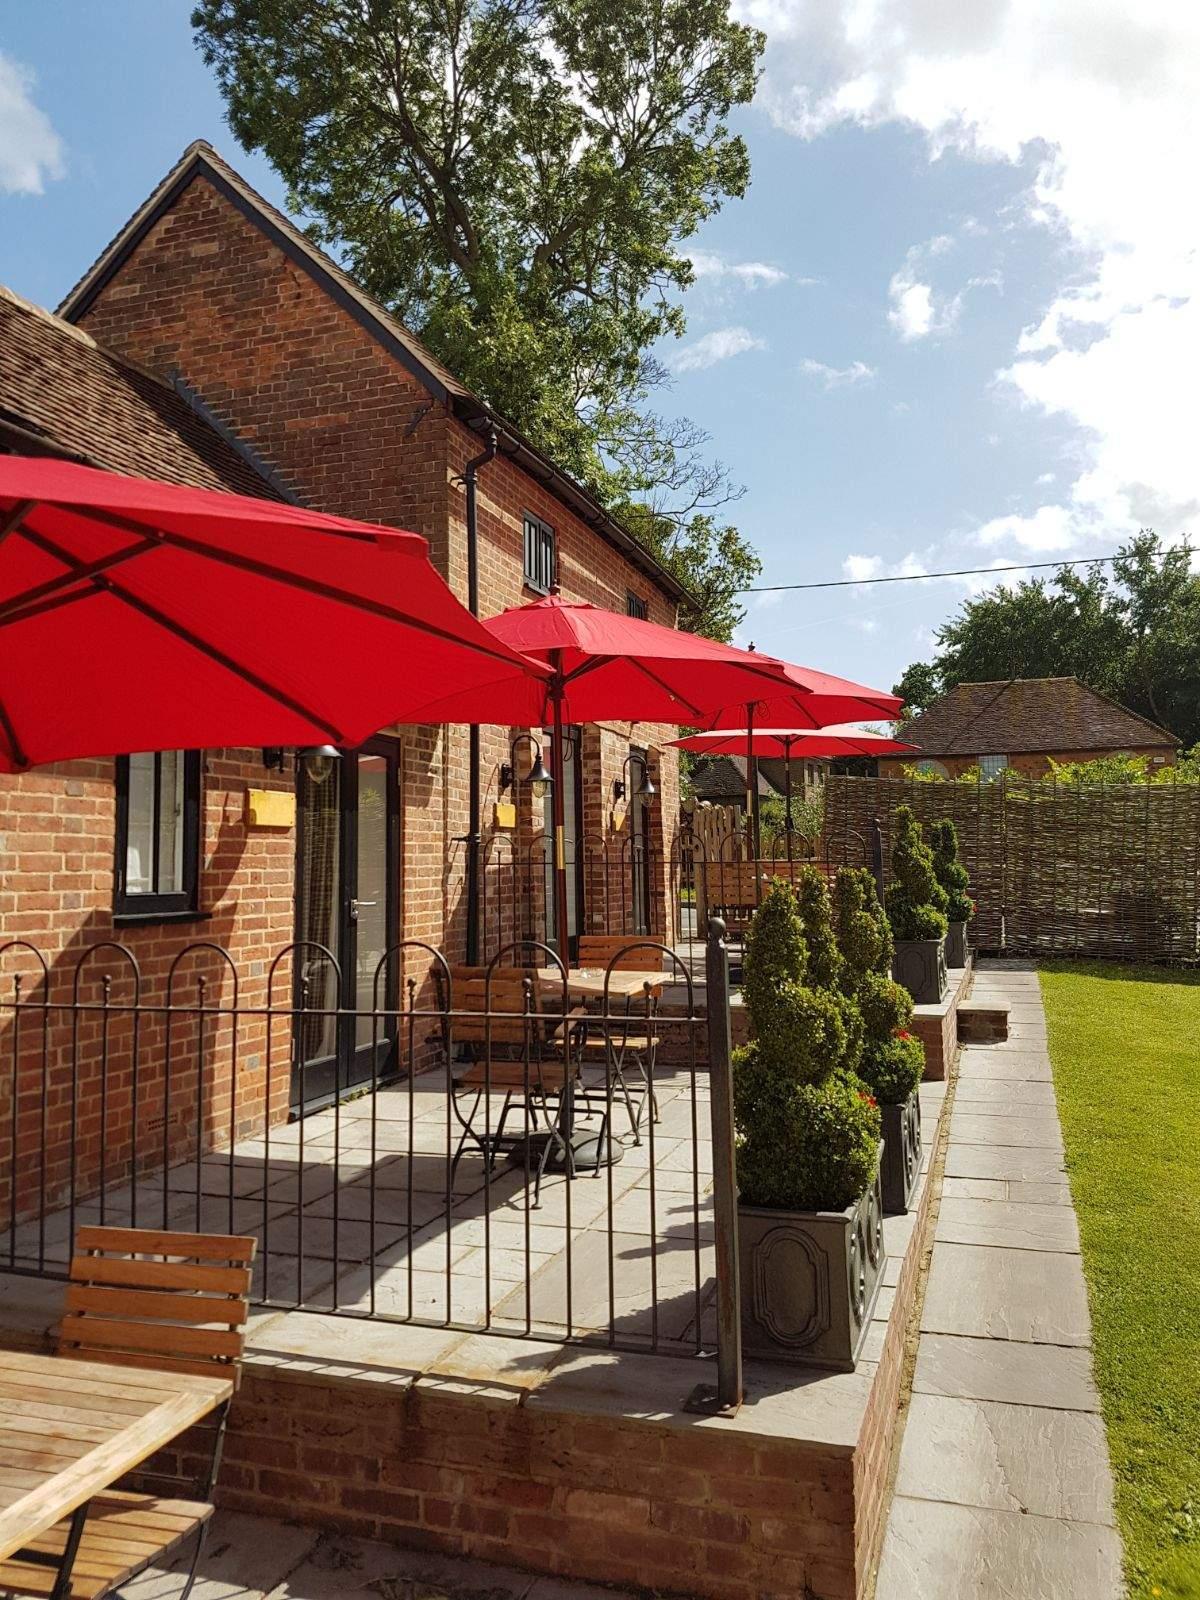 Sunny pub garden